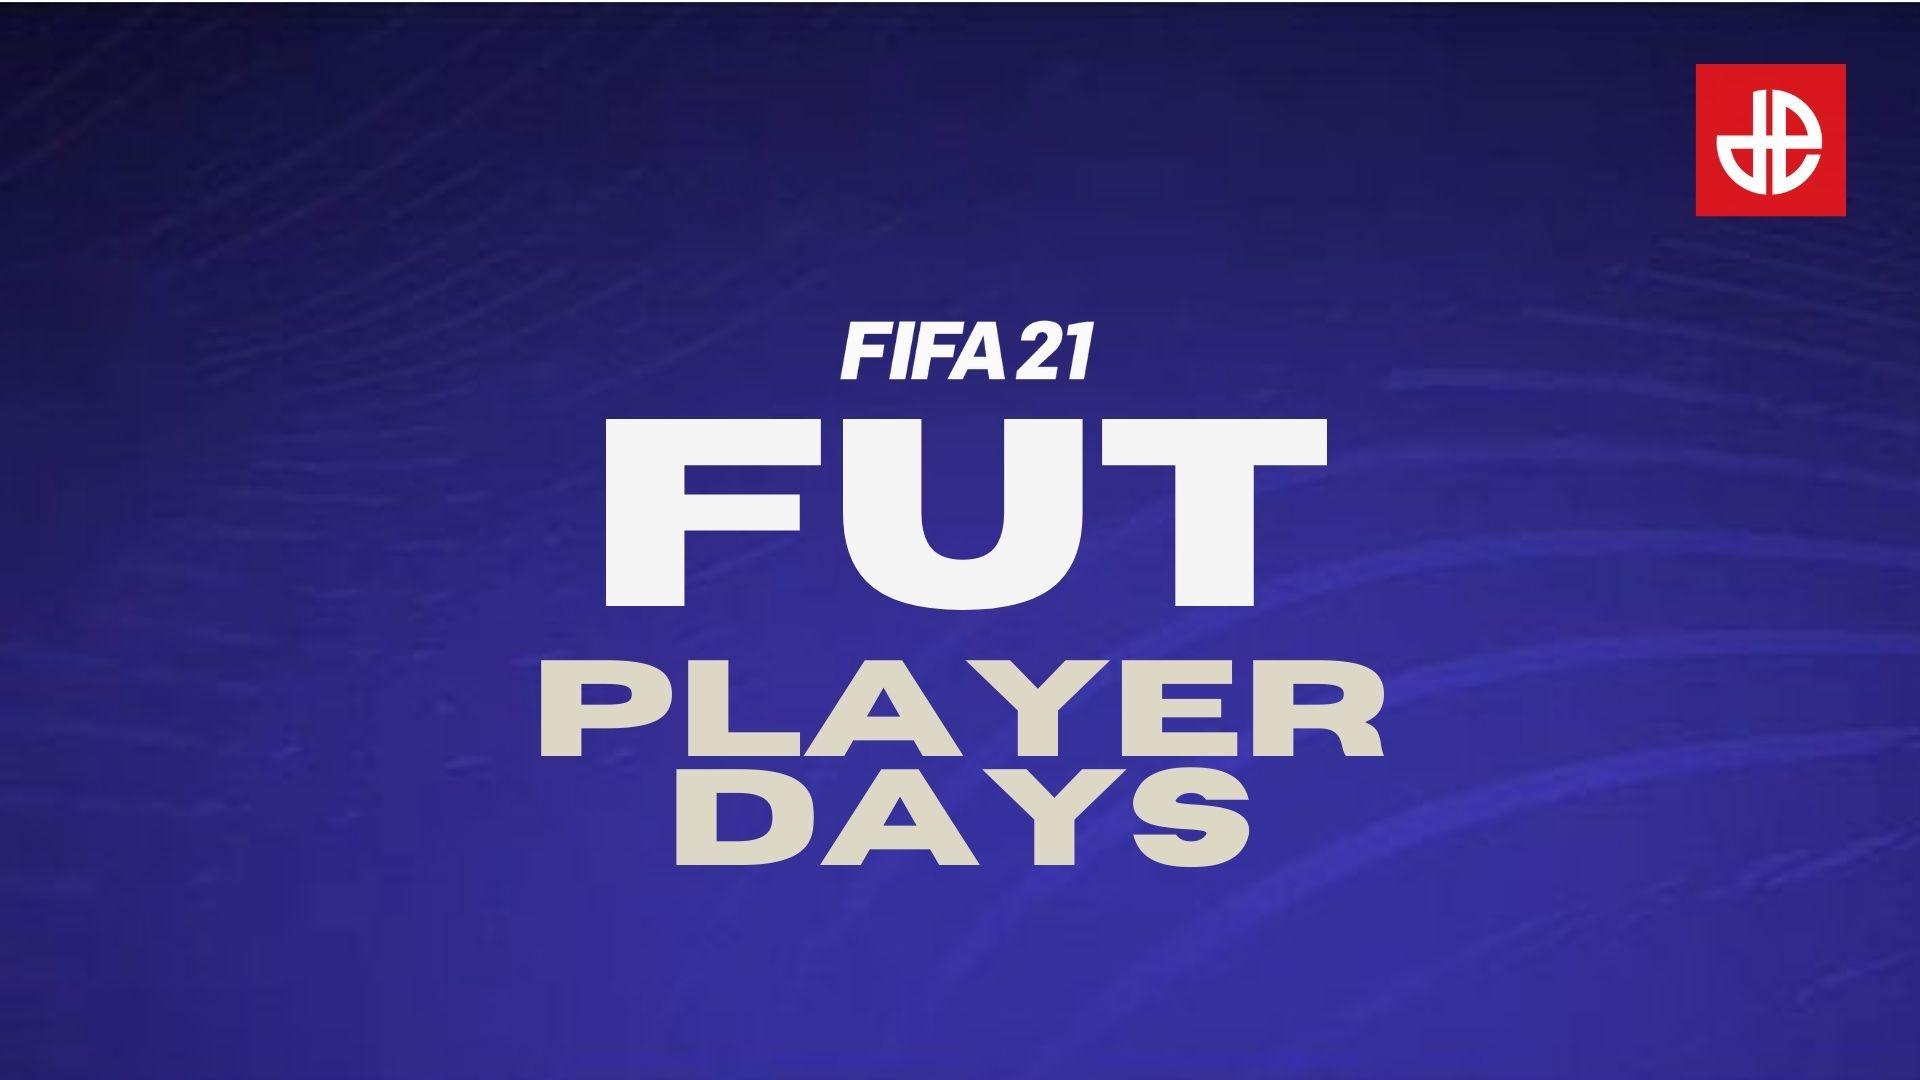 FIFA 21 FUT Player Days logo